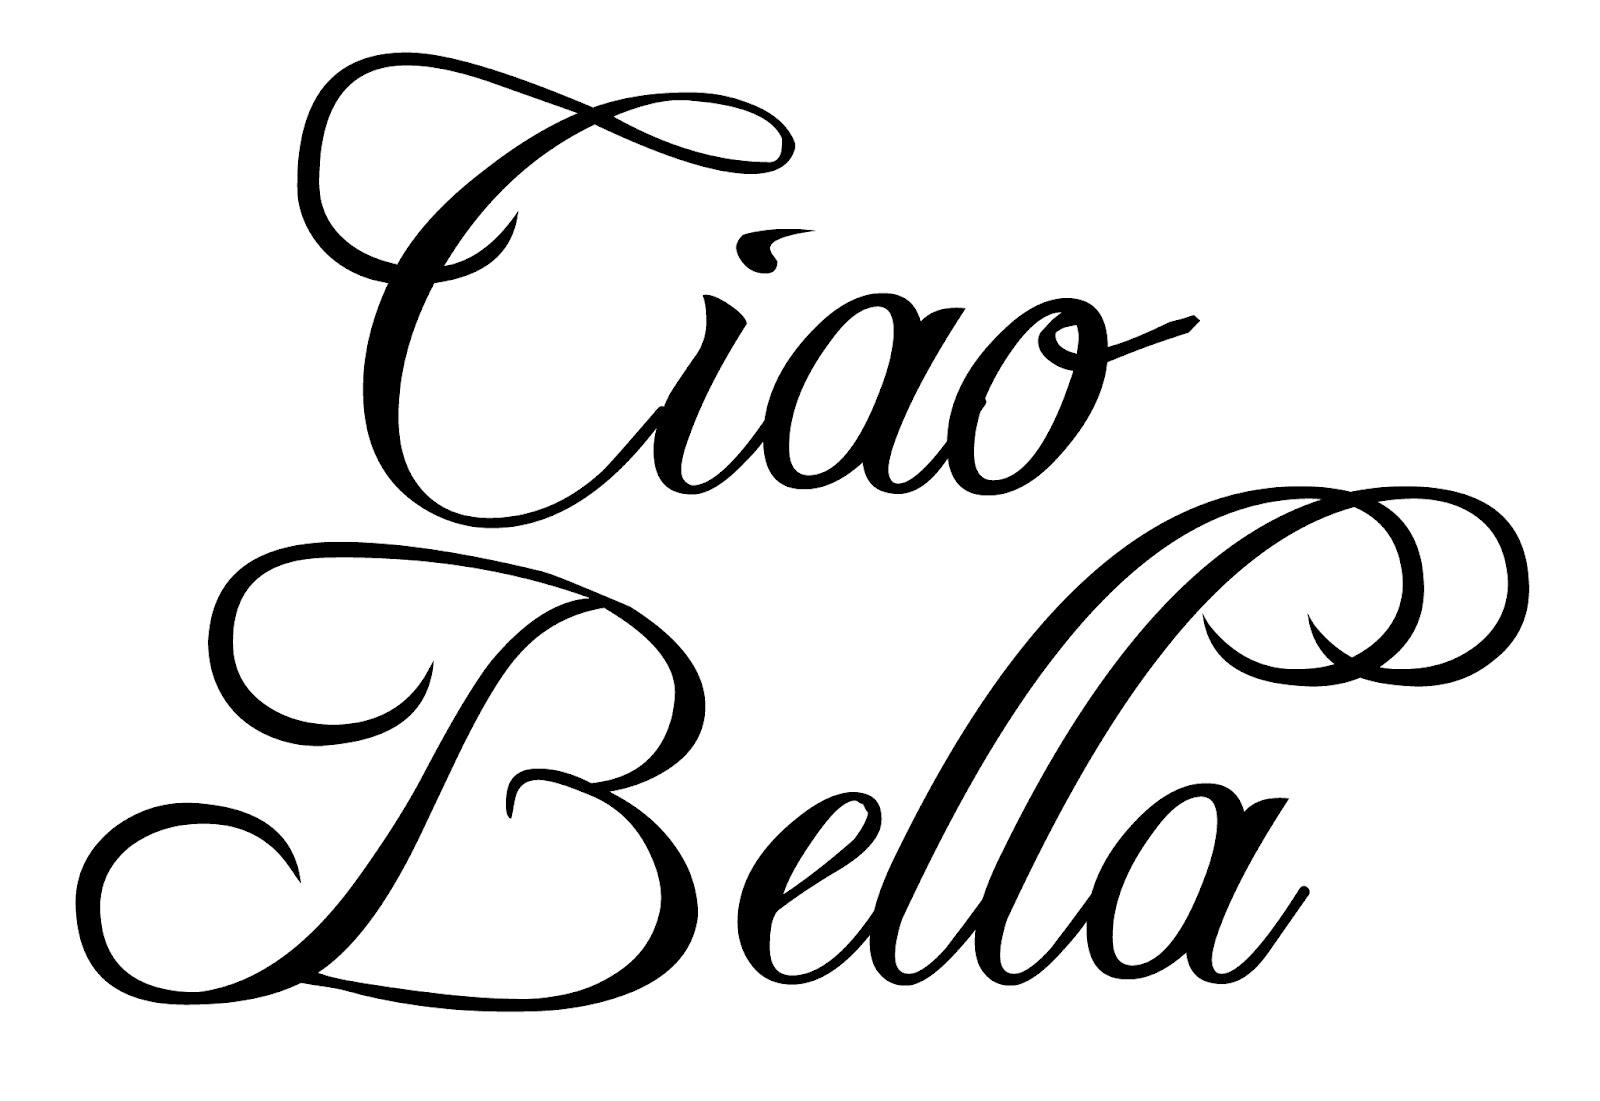 Bella clipart.